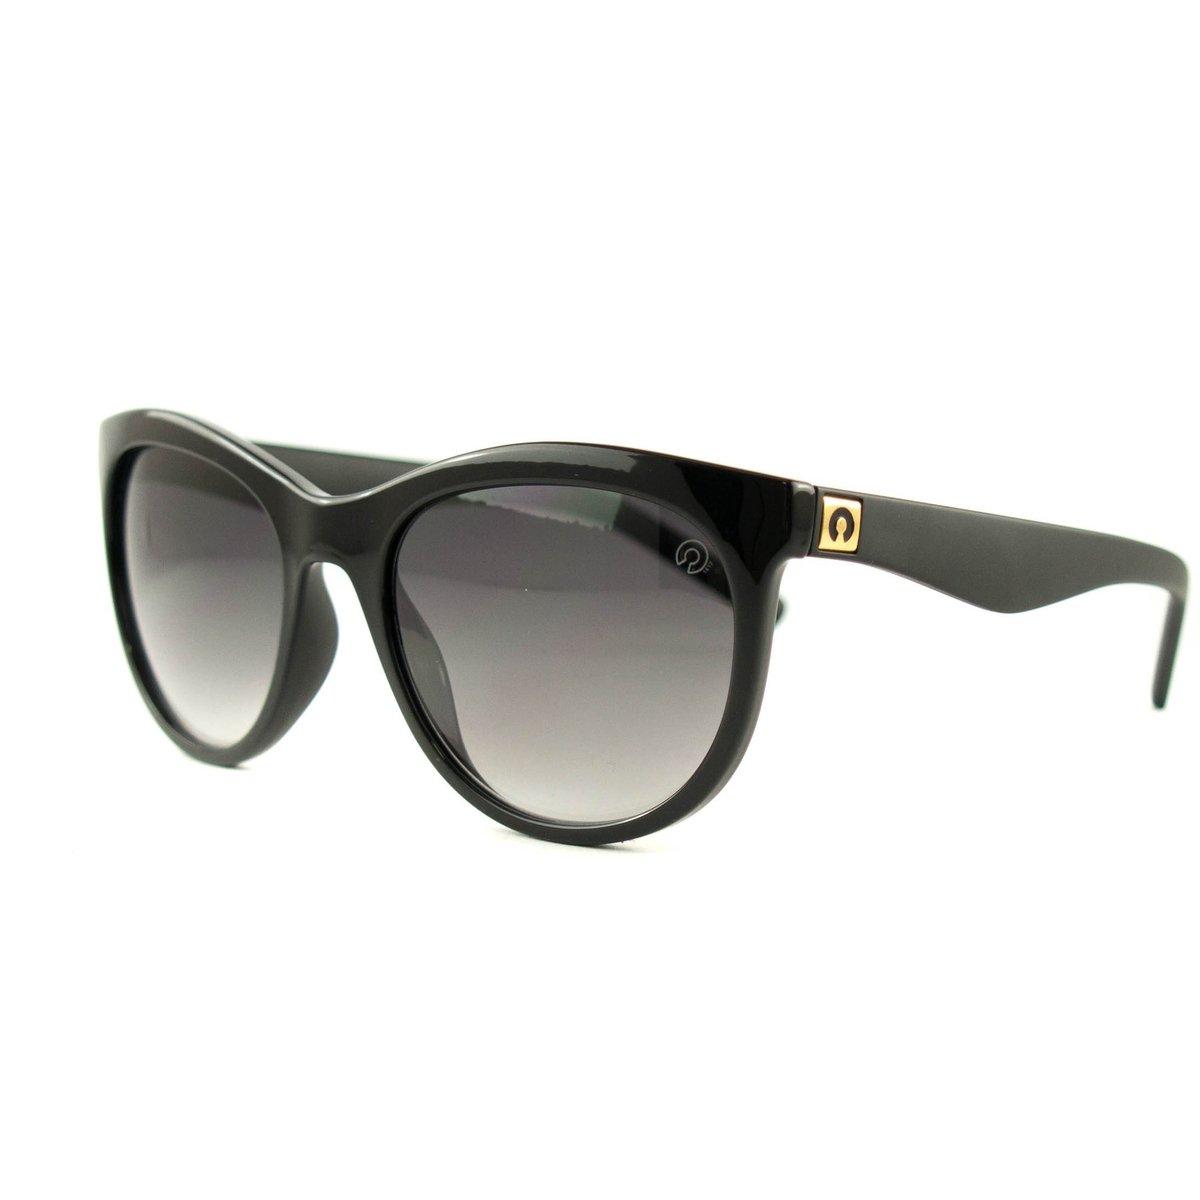 Óculos de Sol Secret Nina Espelhado - Compre Agora   Netshoes 17dea76bfb